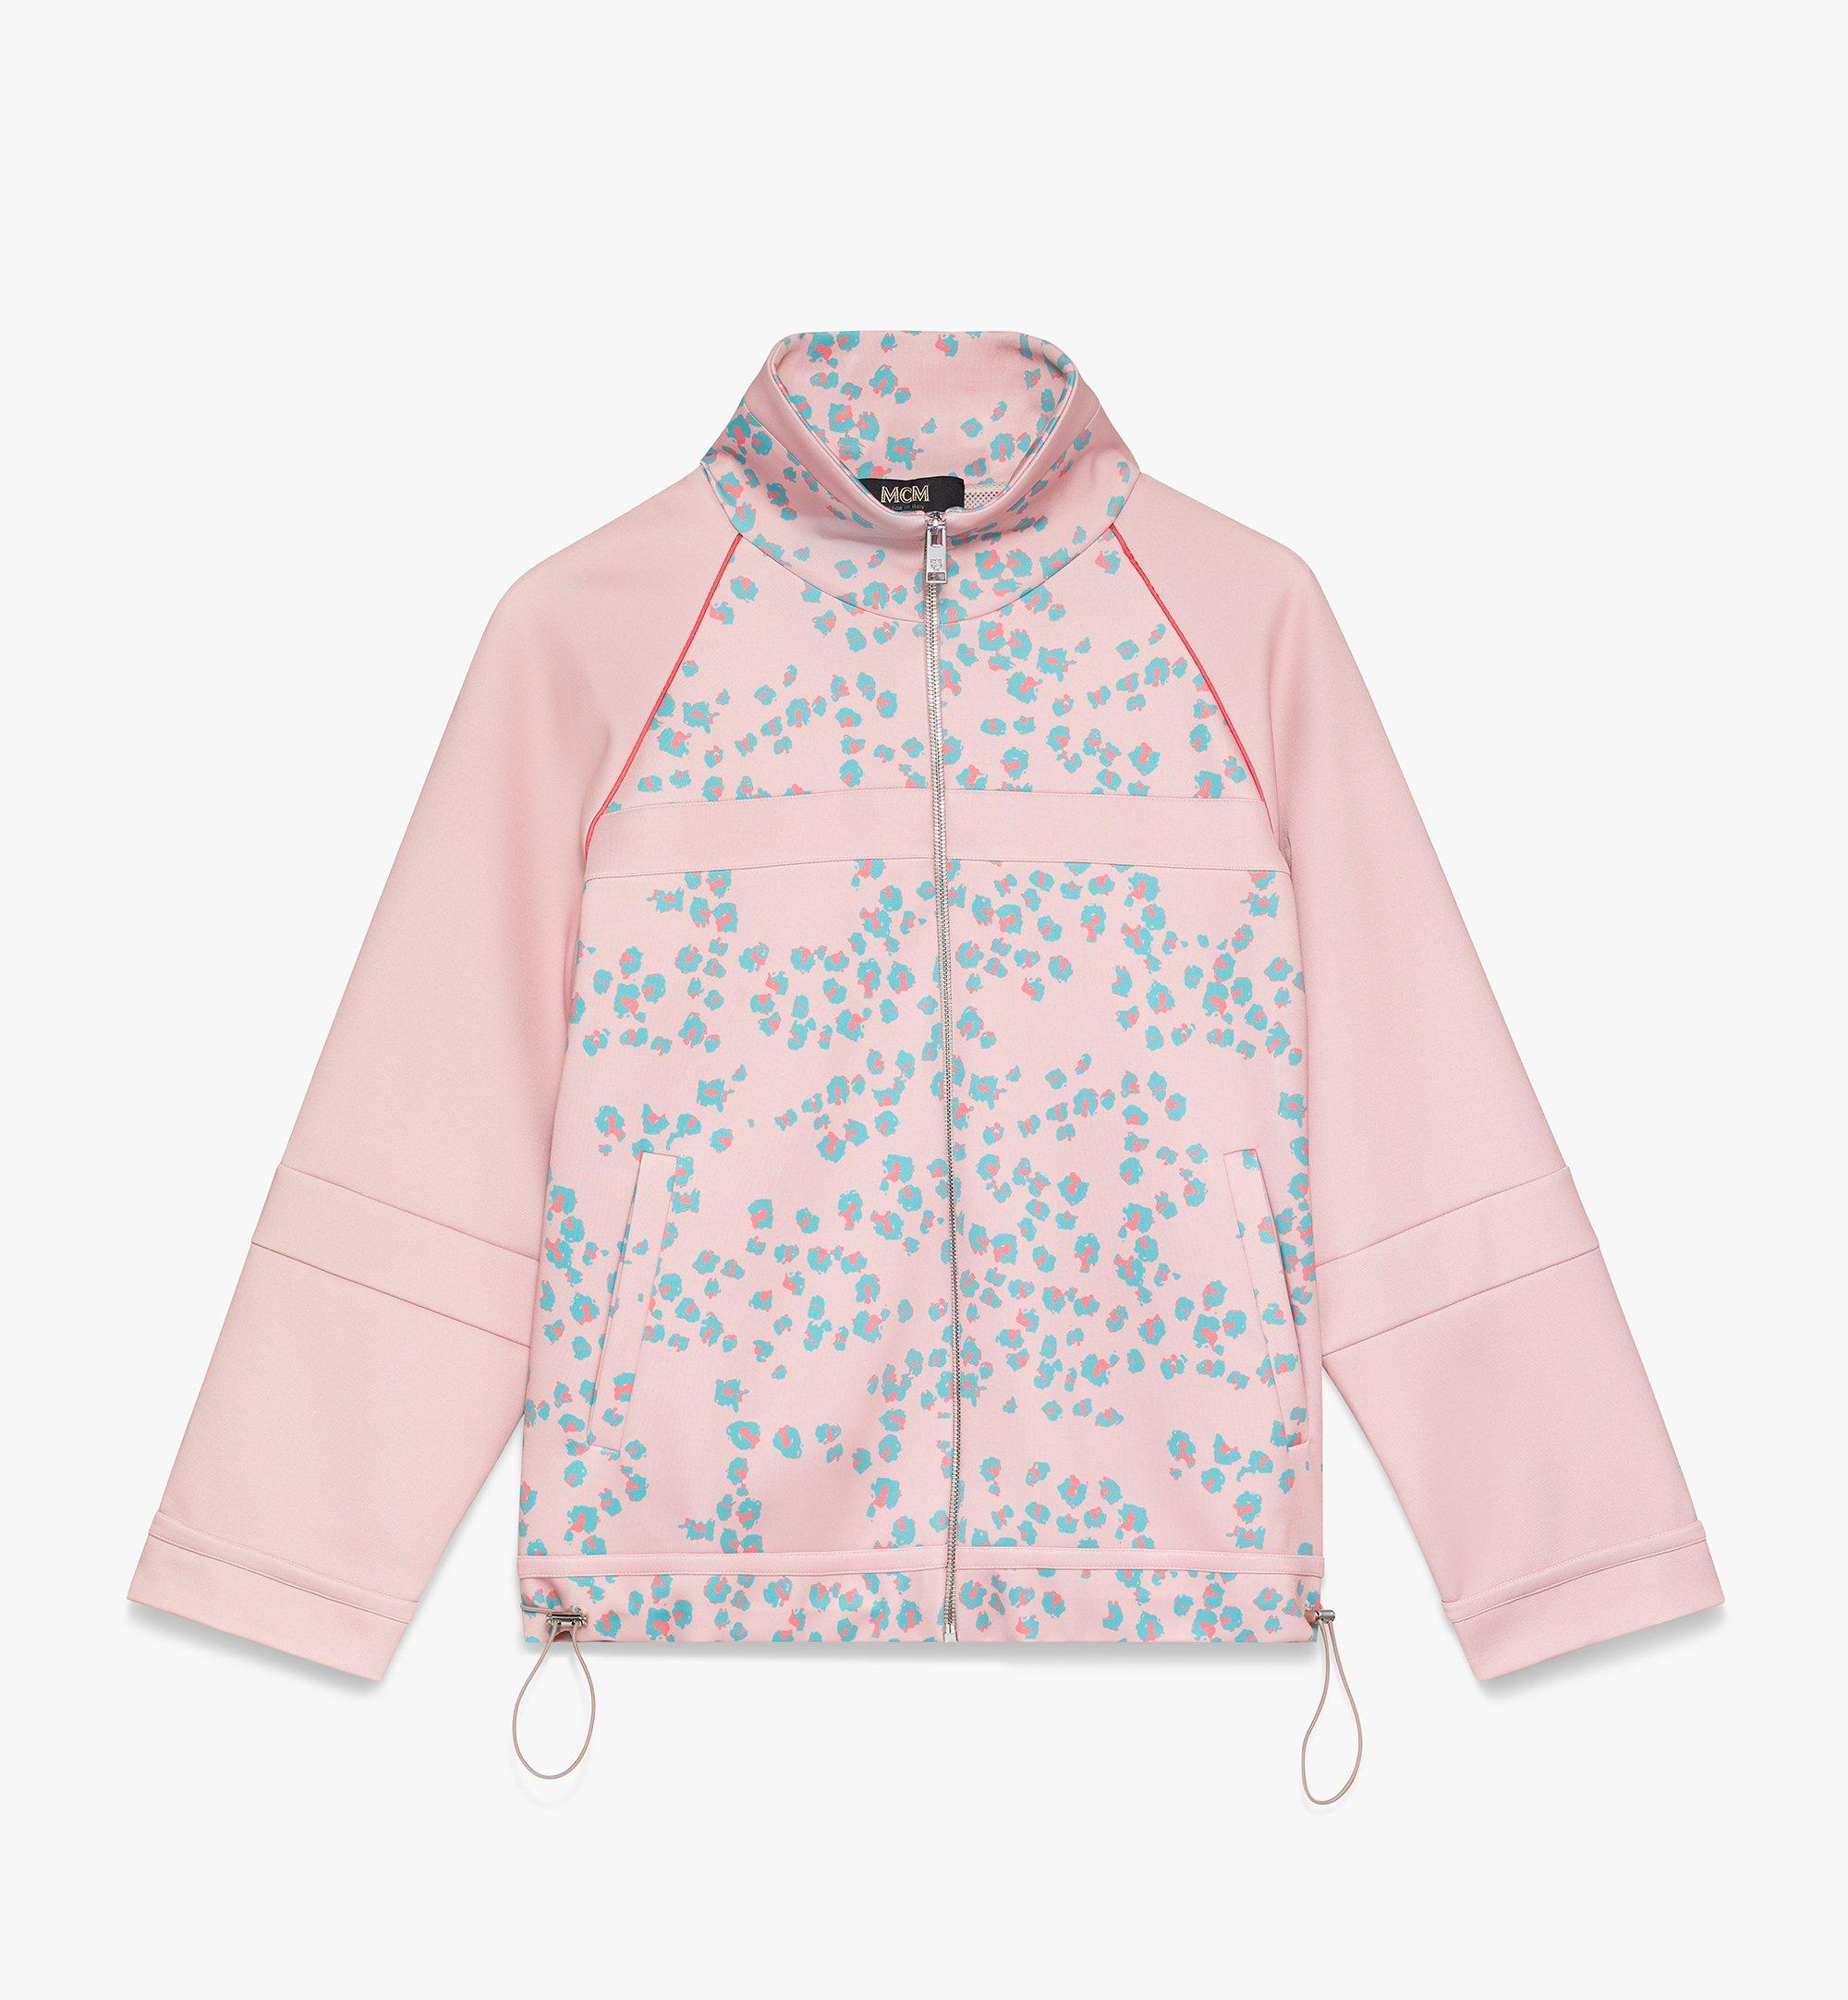 MCM Women's Floral Leopard Print Track Jacket Pink MFJASSE01QI00S Alternate View 1